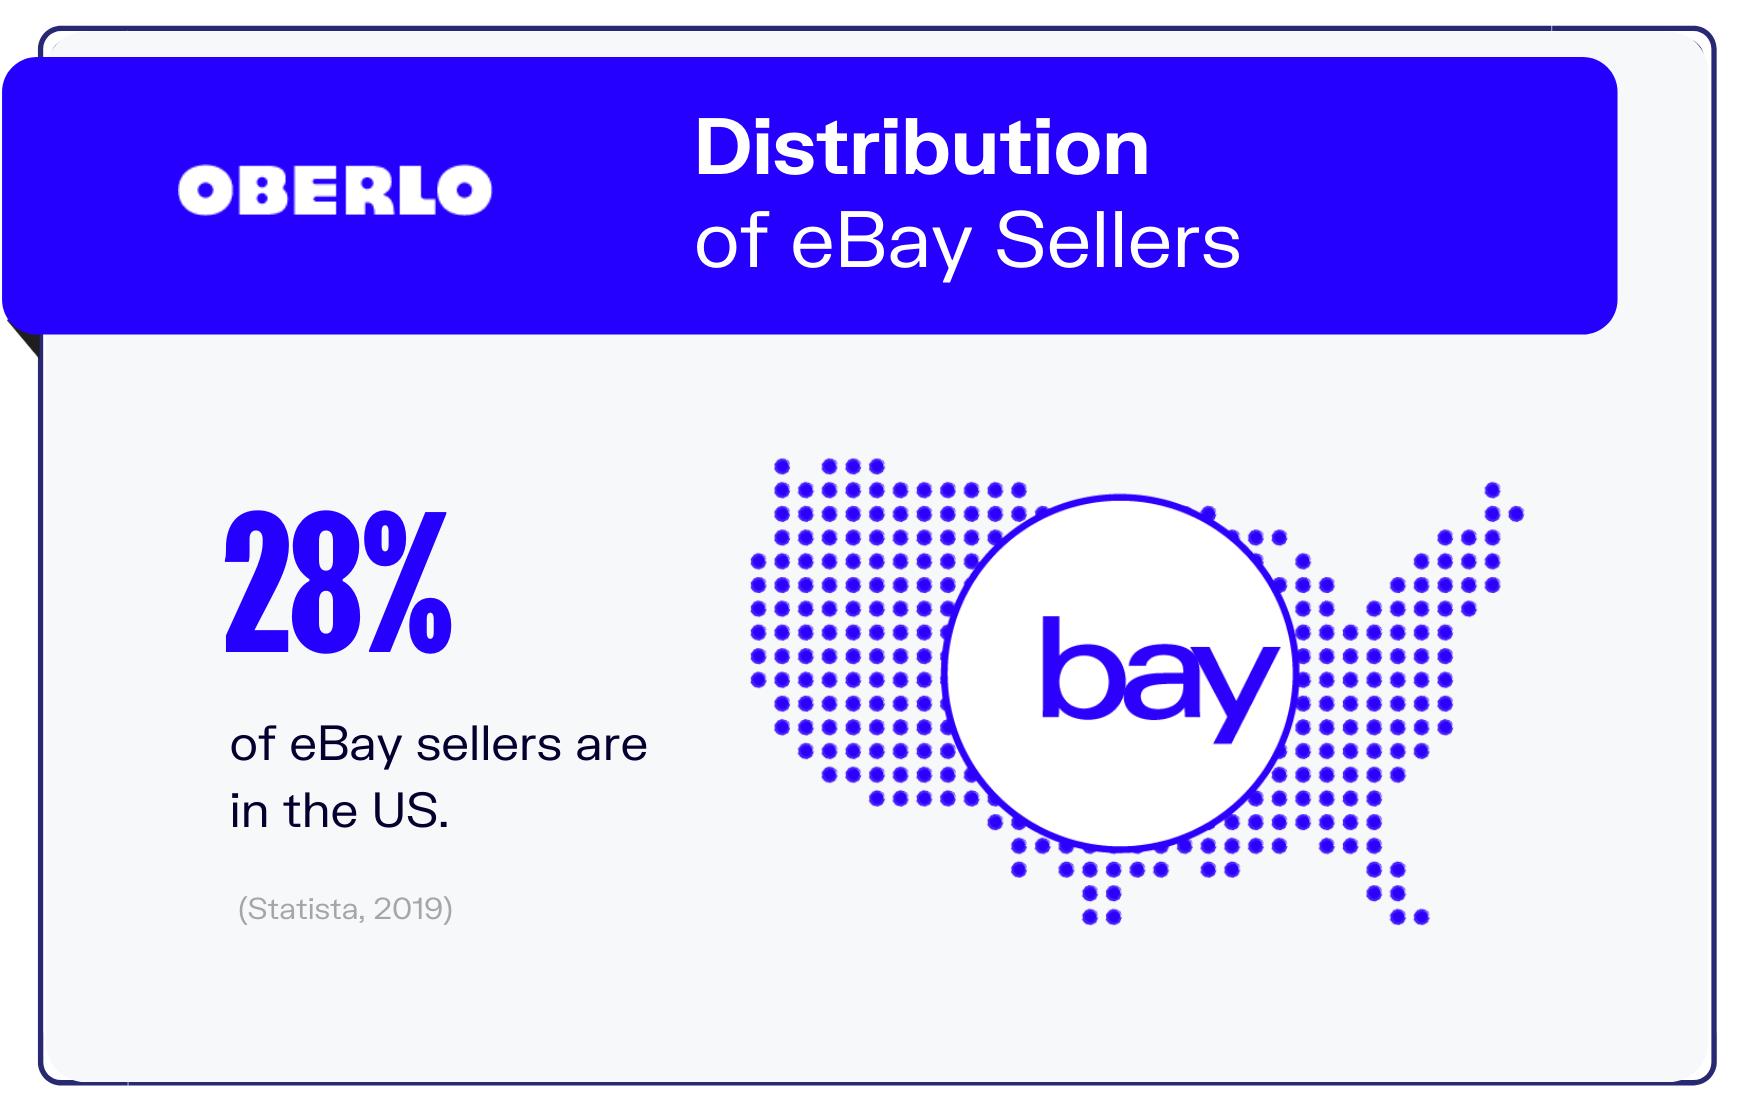 ebay statistics graphic 10